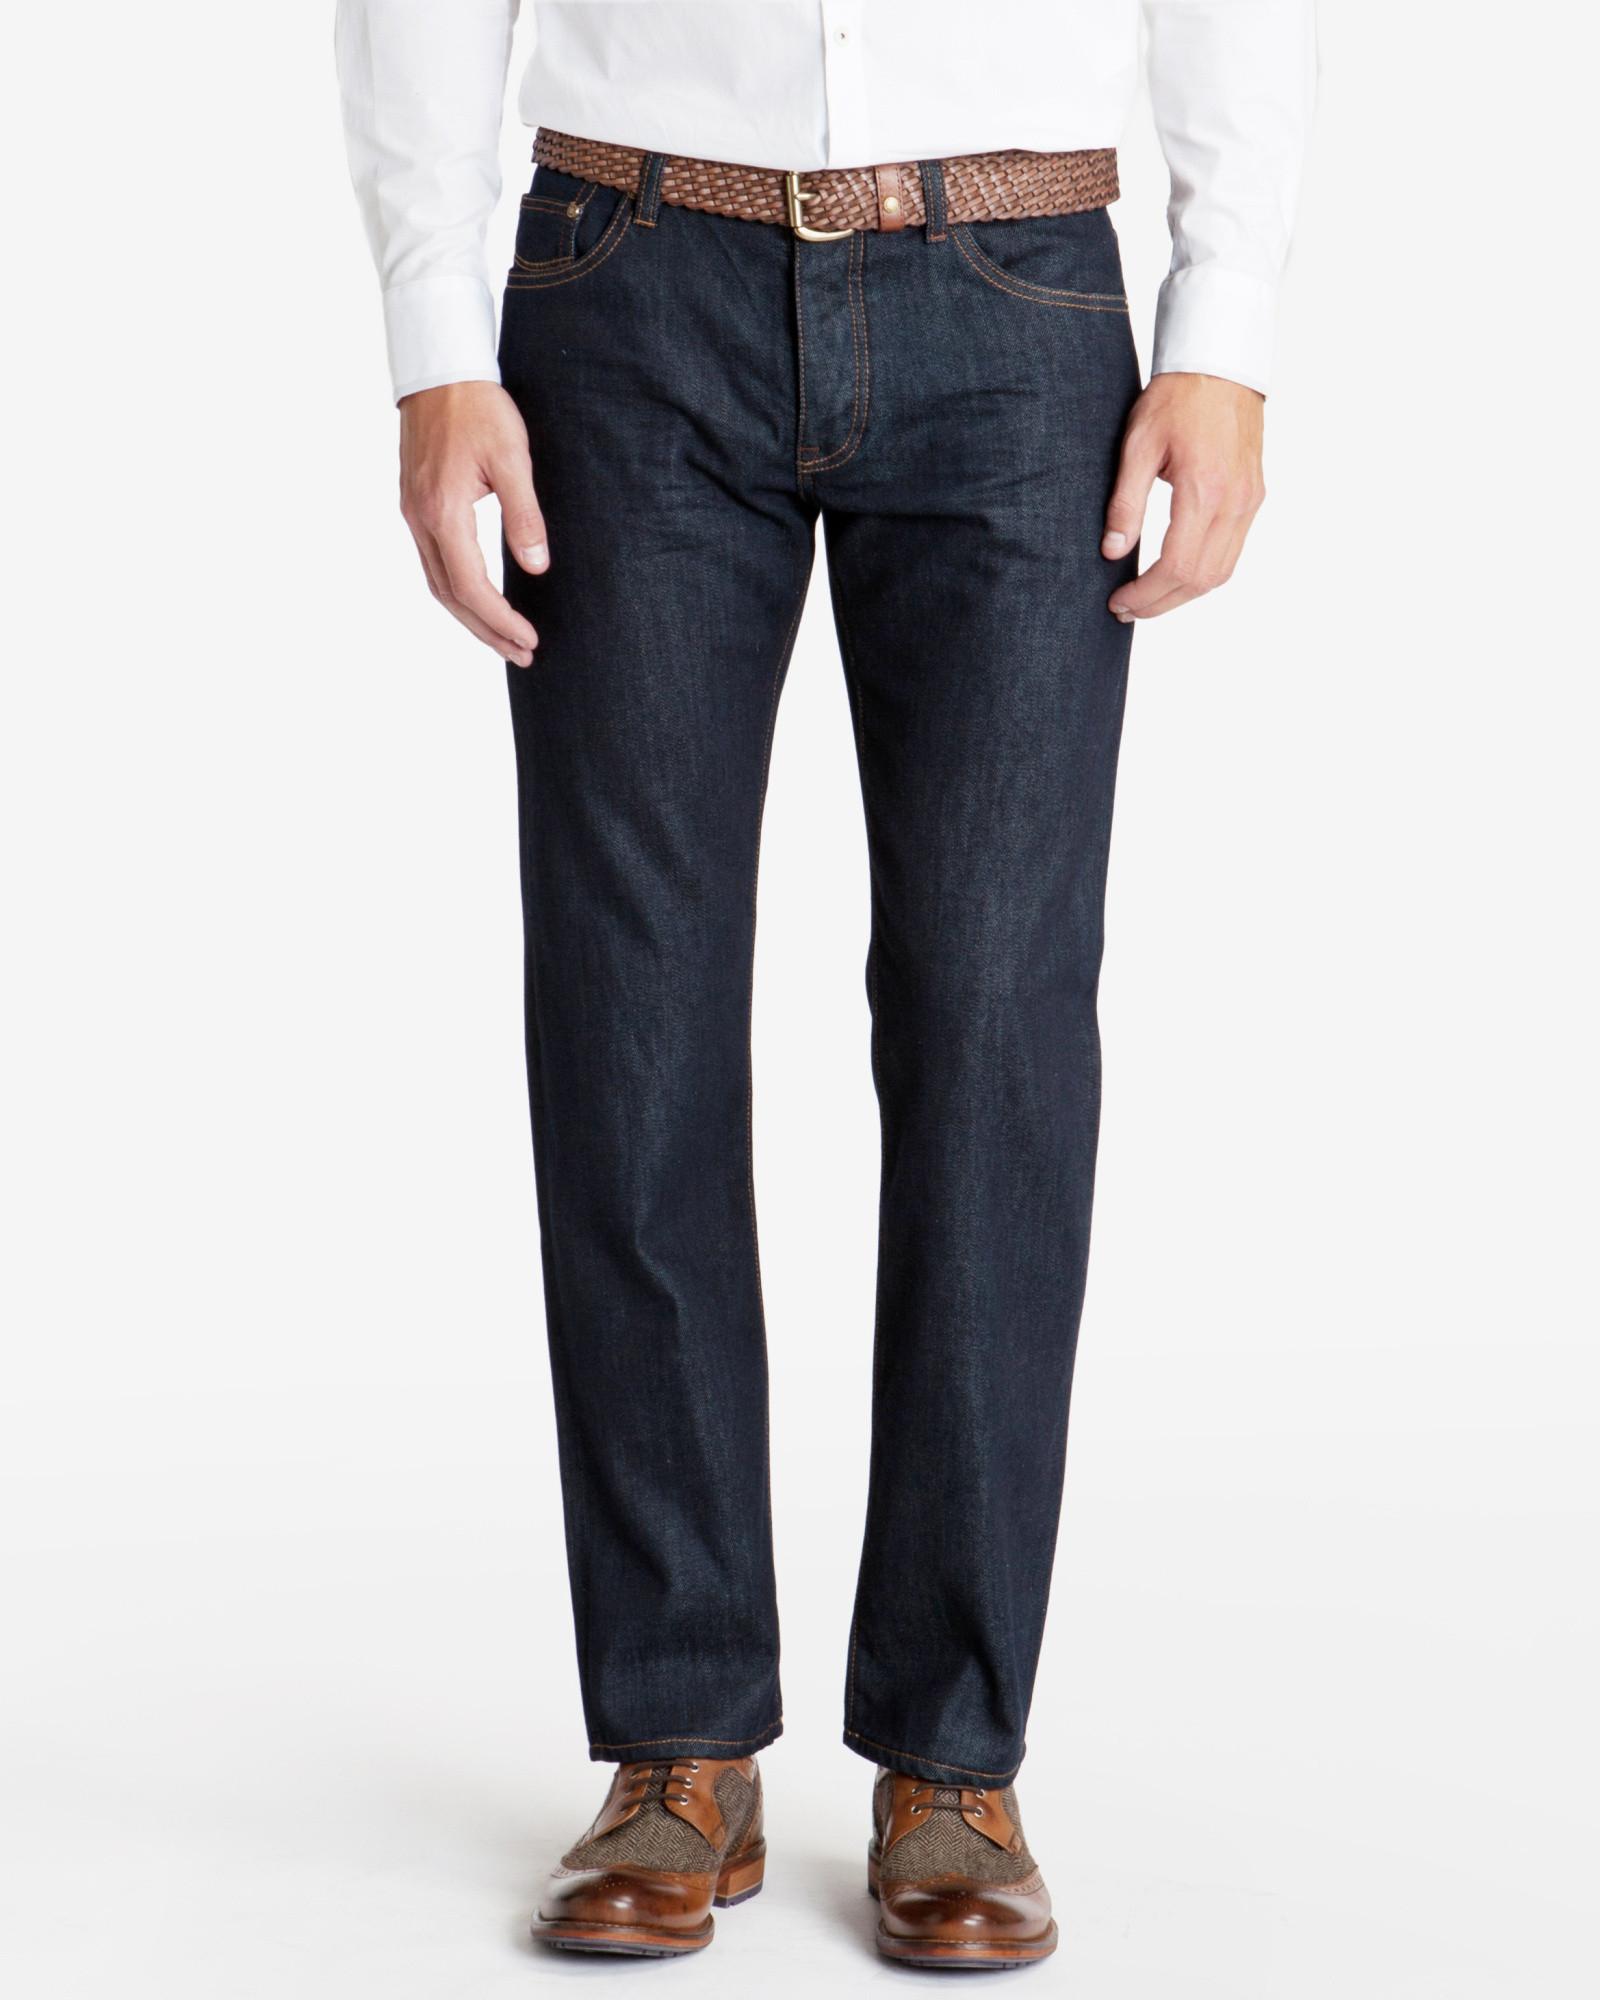 5304d340b4517 Lyst - Ted Baker Obsign Rinse Wash Denim Jeans in Blue for Men